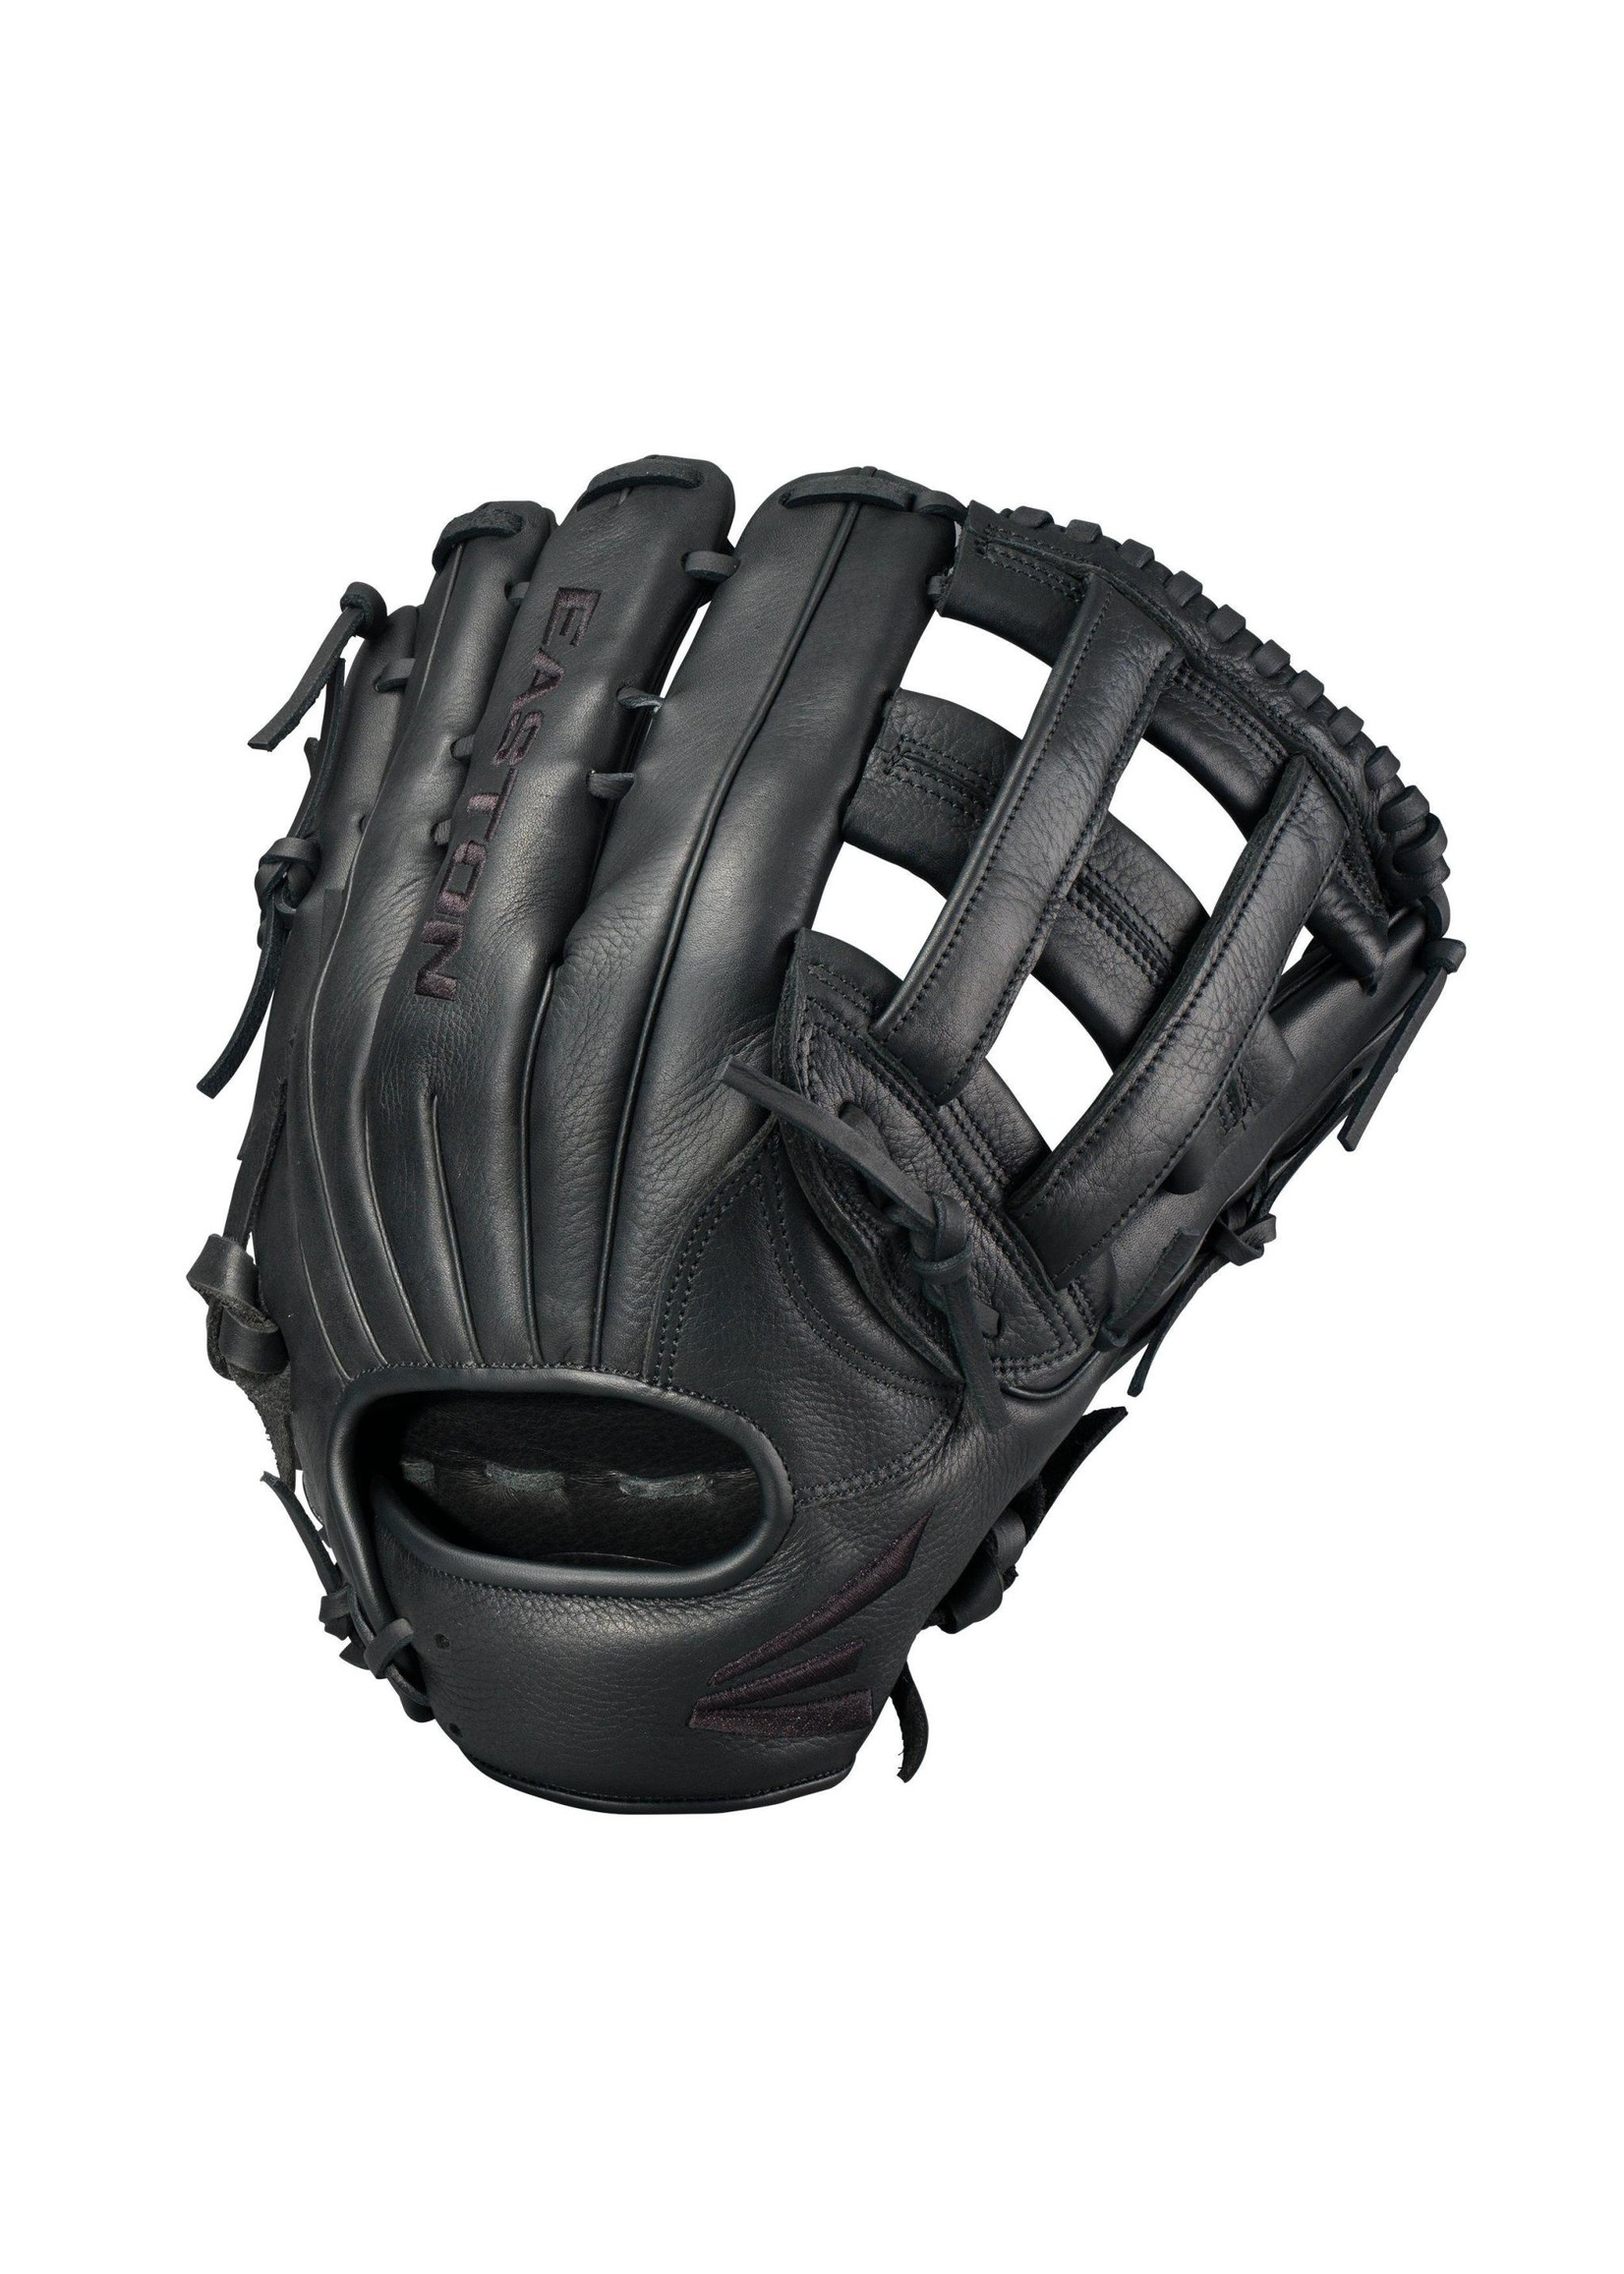 Easton Baseball (Canada) EASTON BLACKSTONE 13 INCHES H WEB